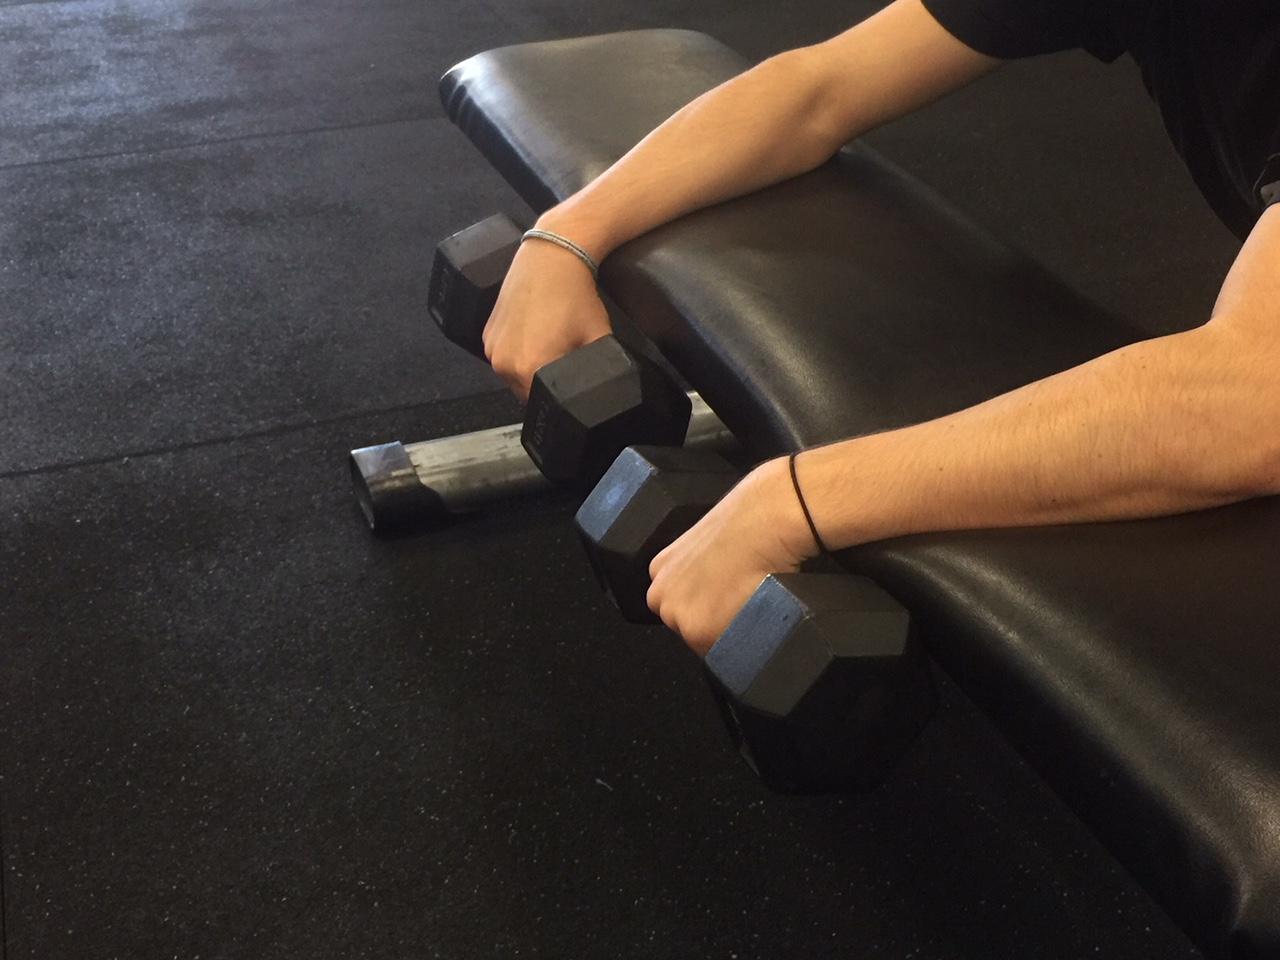 wrist extension